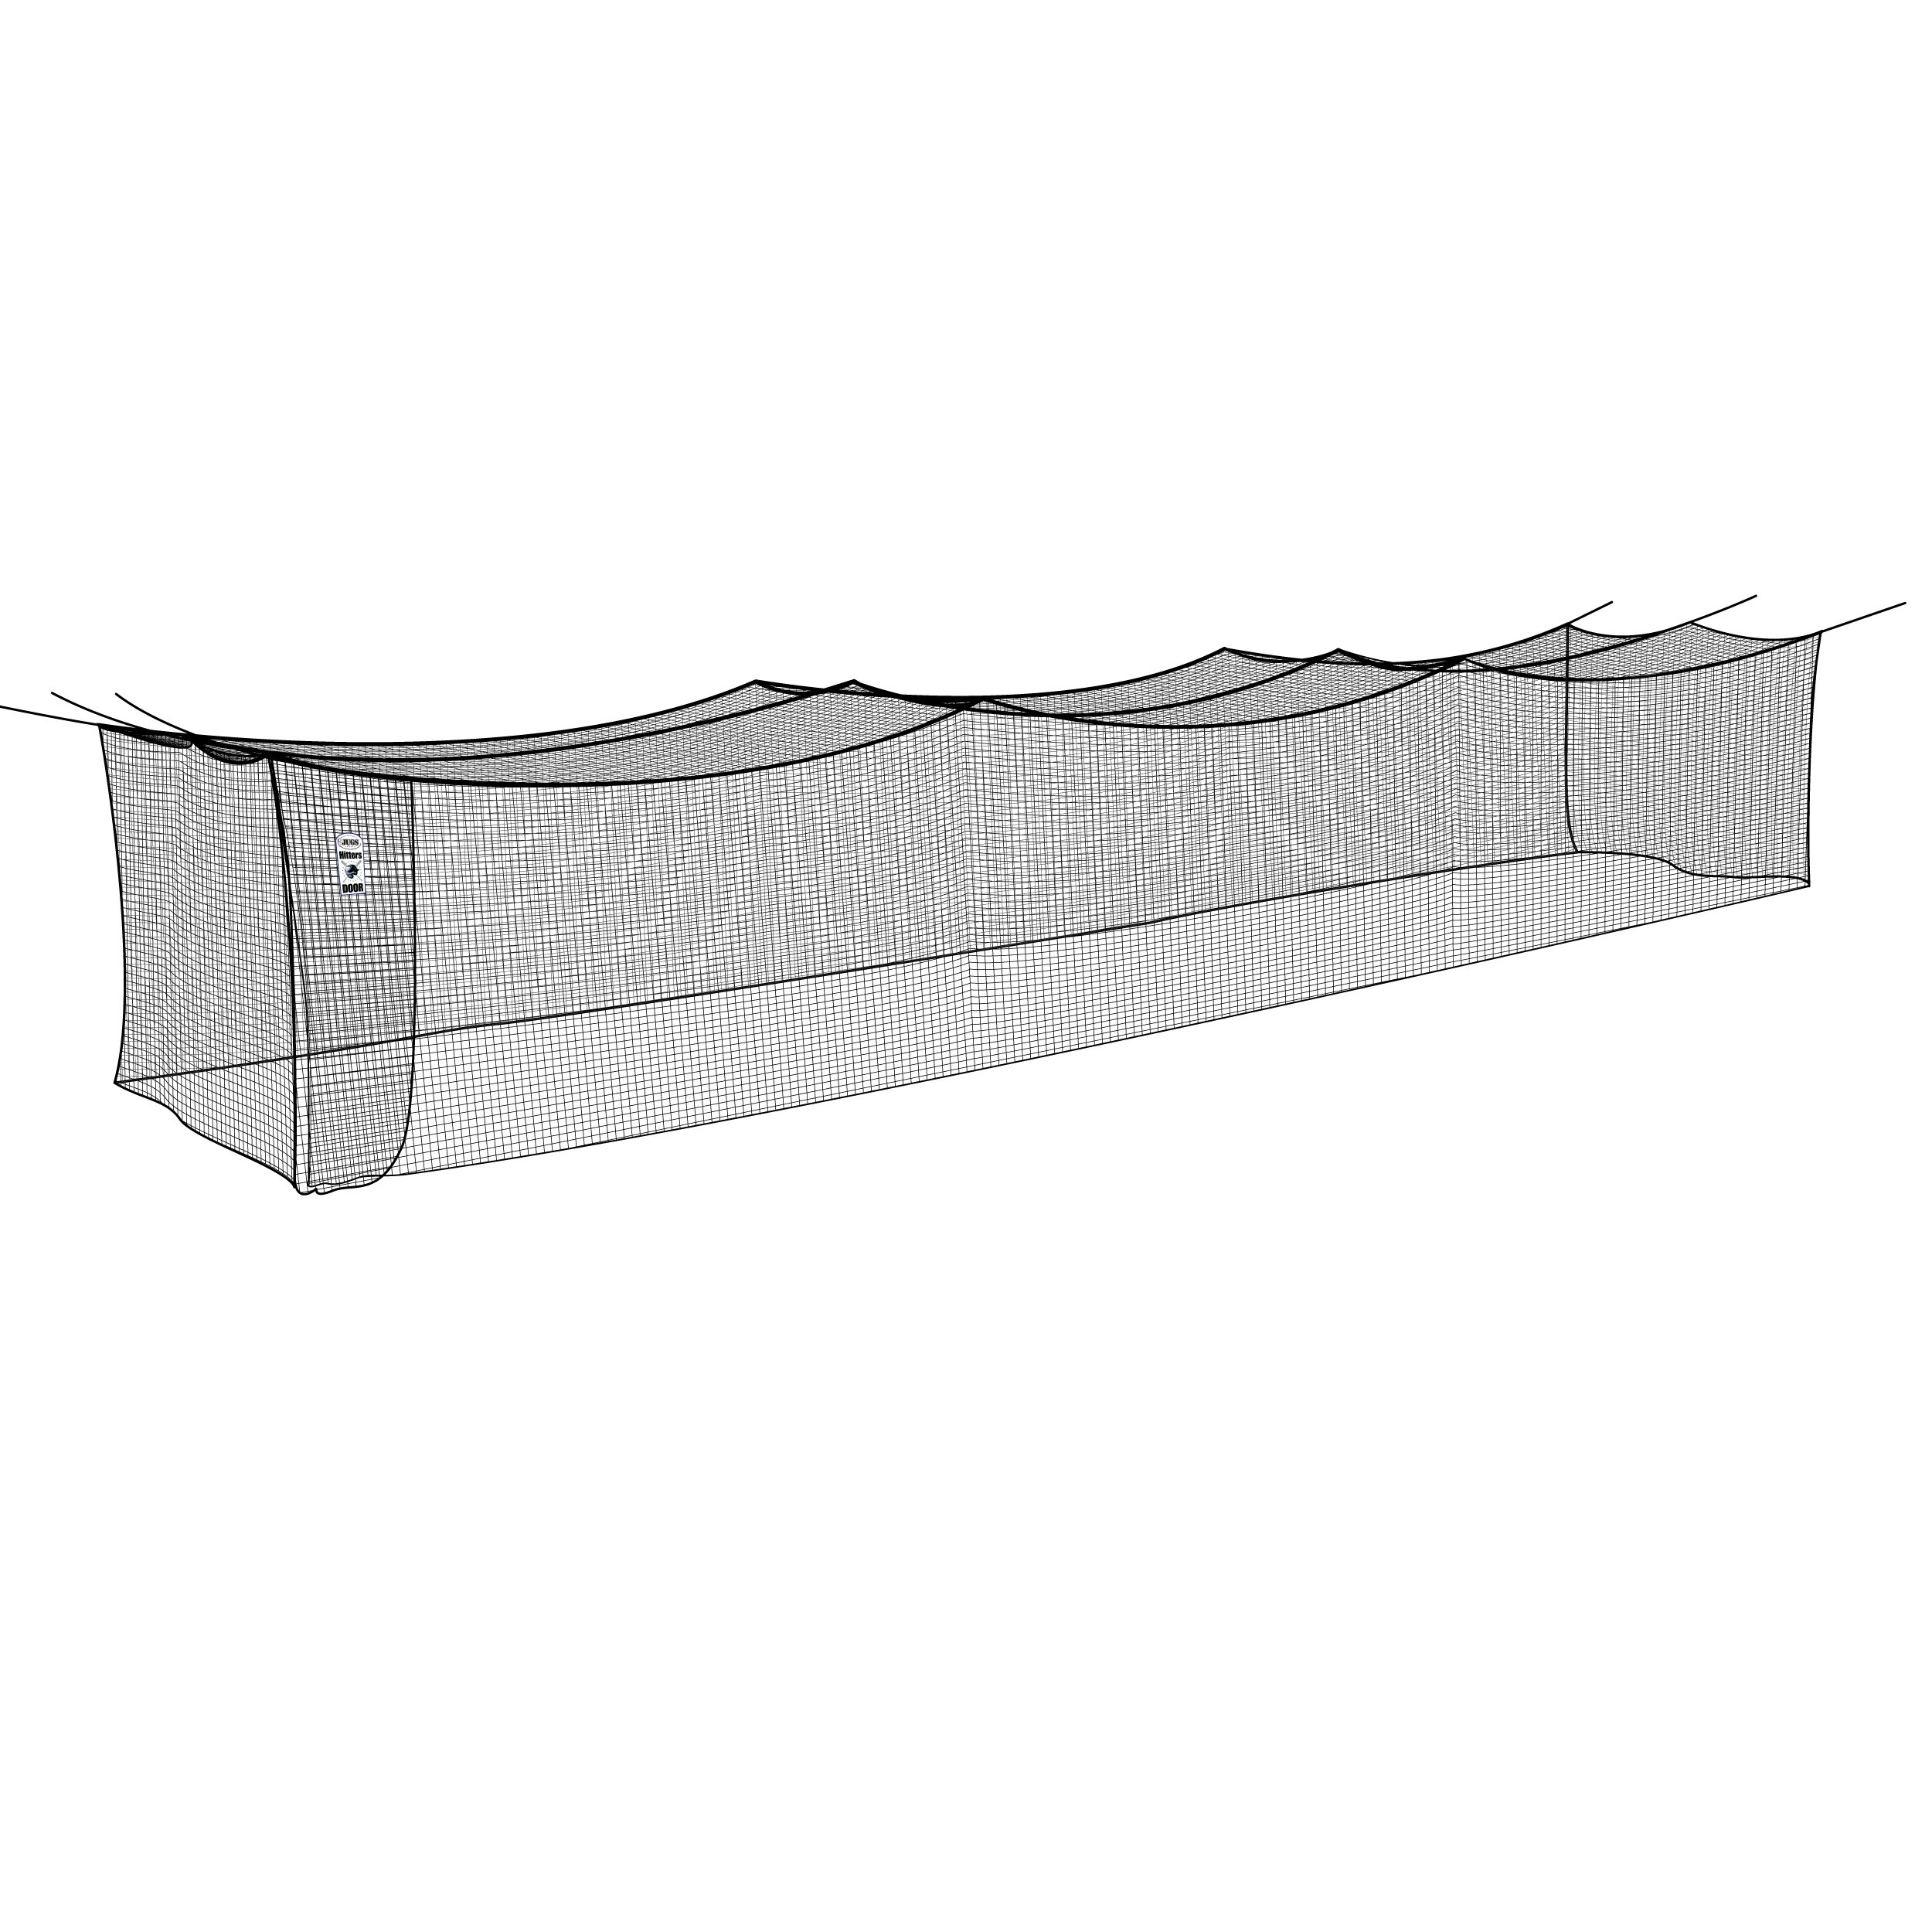 Jugs Batting Cage Nets - #27 Twisted Knotted Black Polyethylene